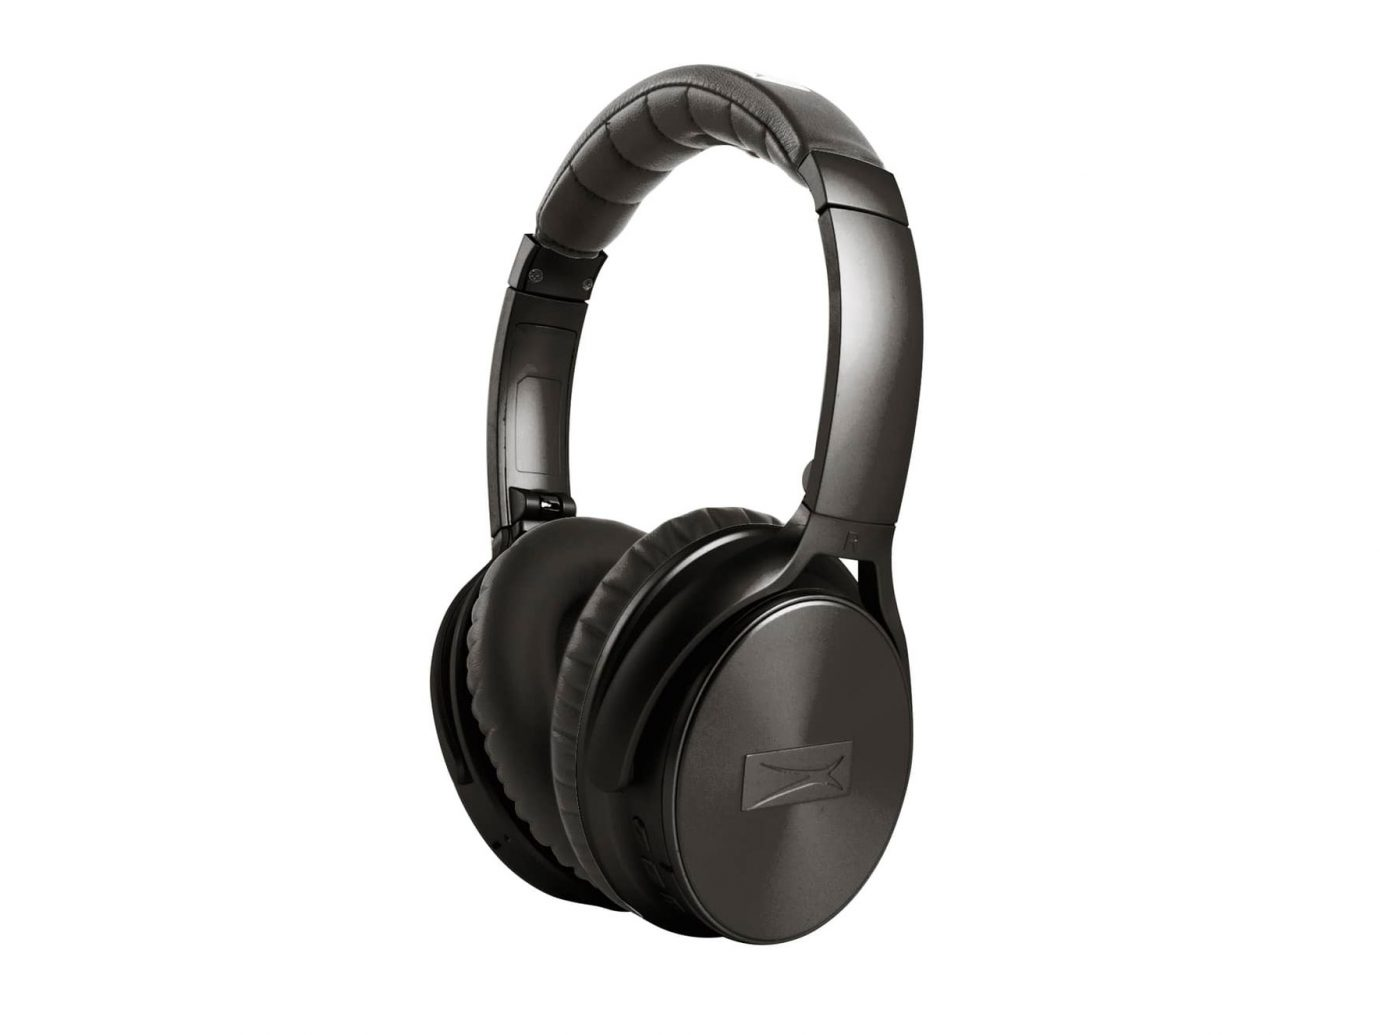 Altec Lansing Active Noise Canceling Wireless Headphones